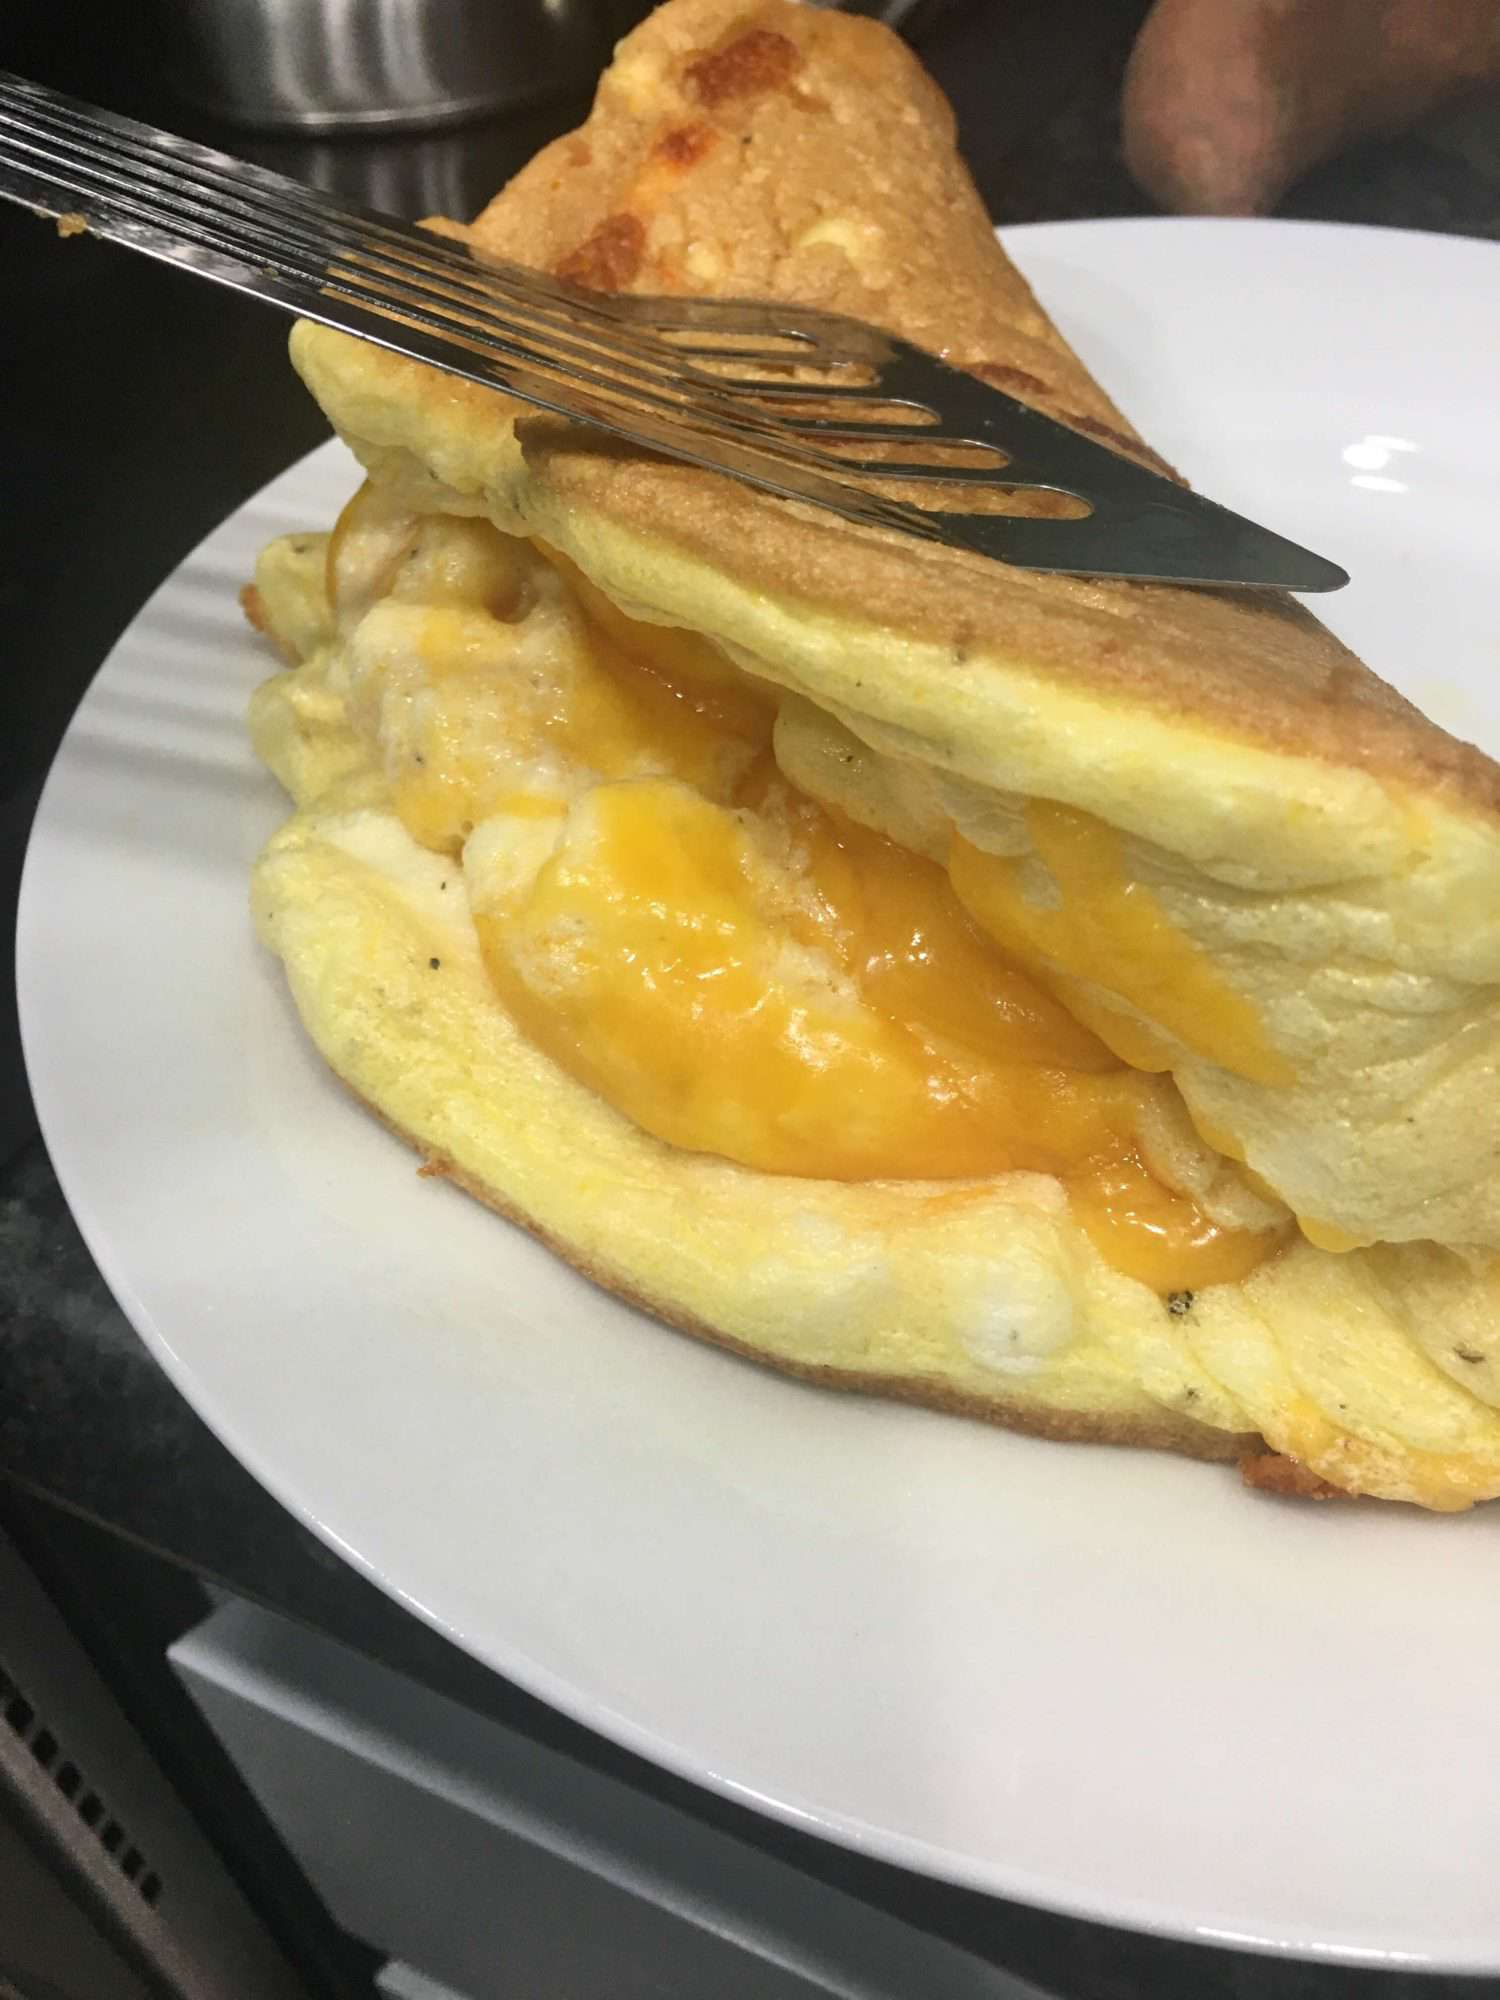 view inside a souffle omelette